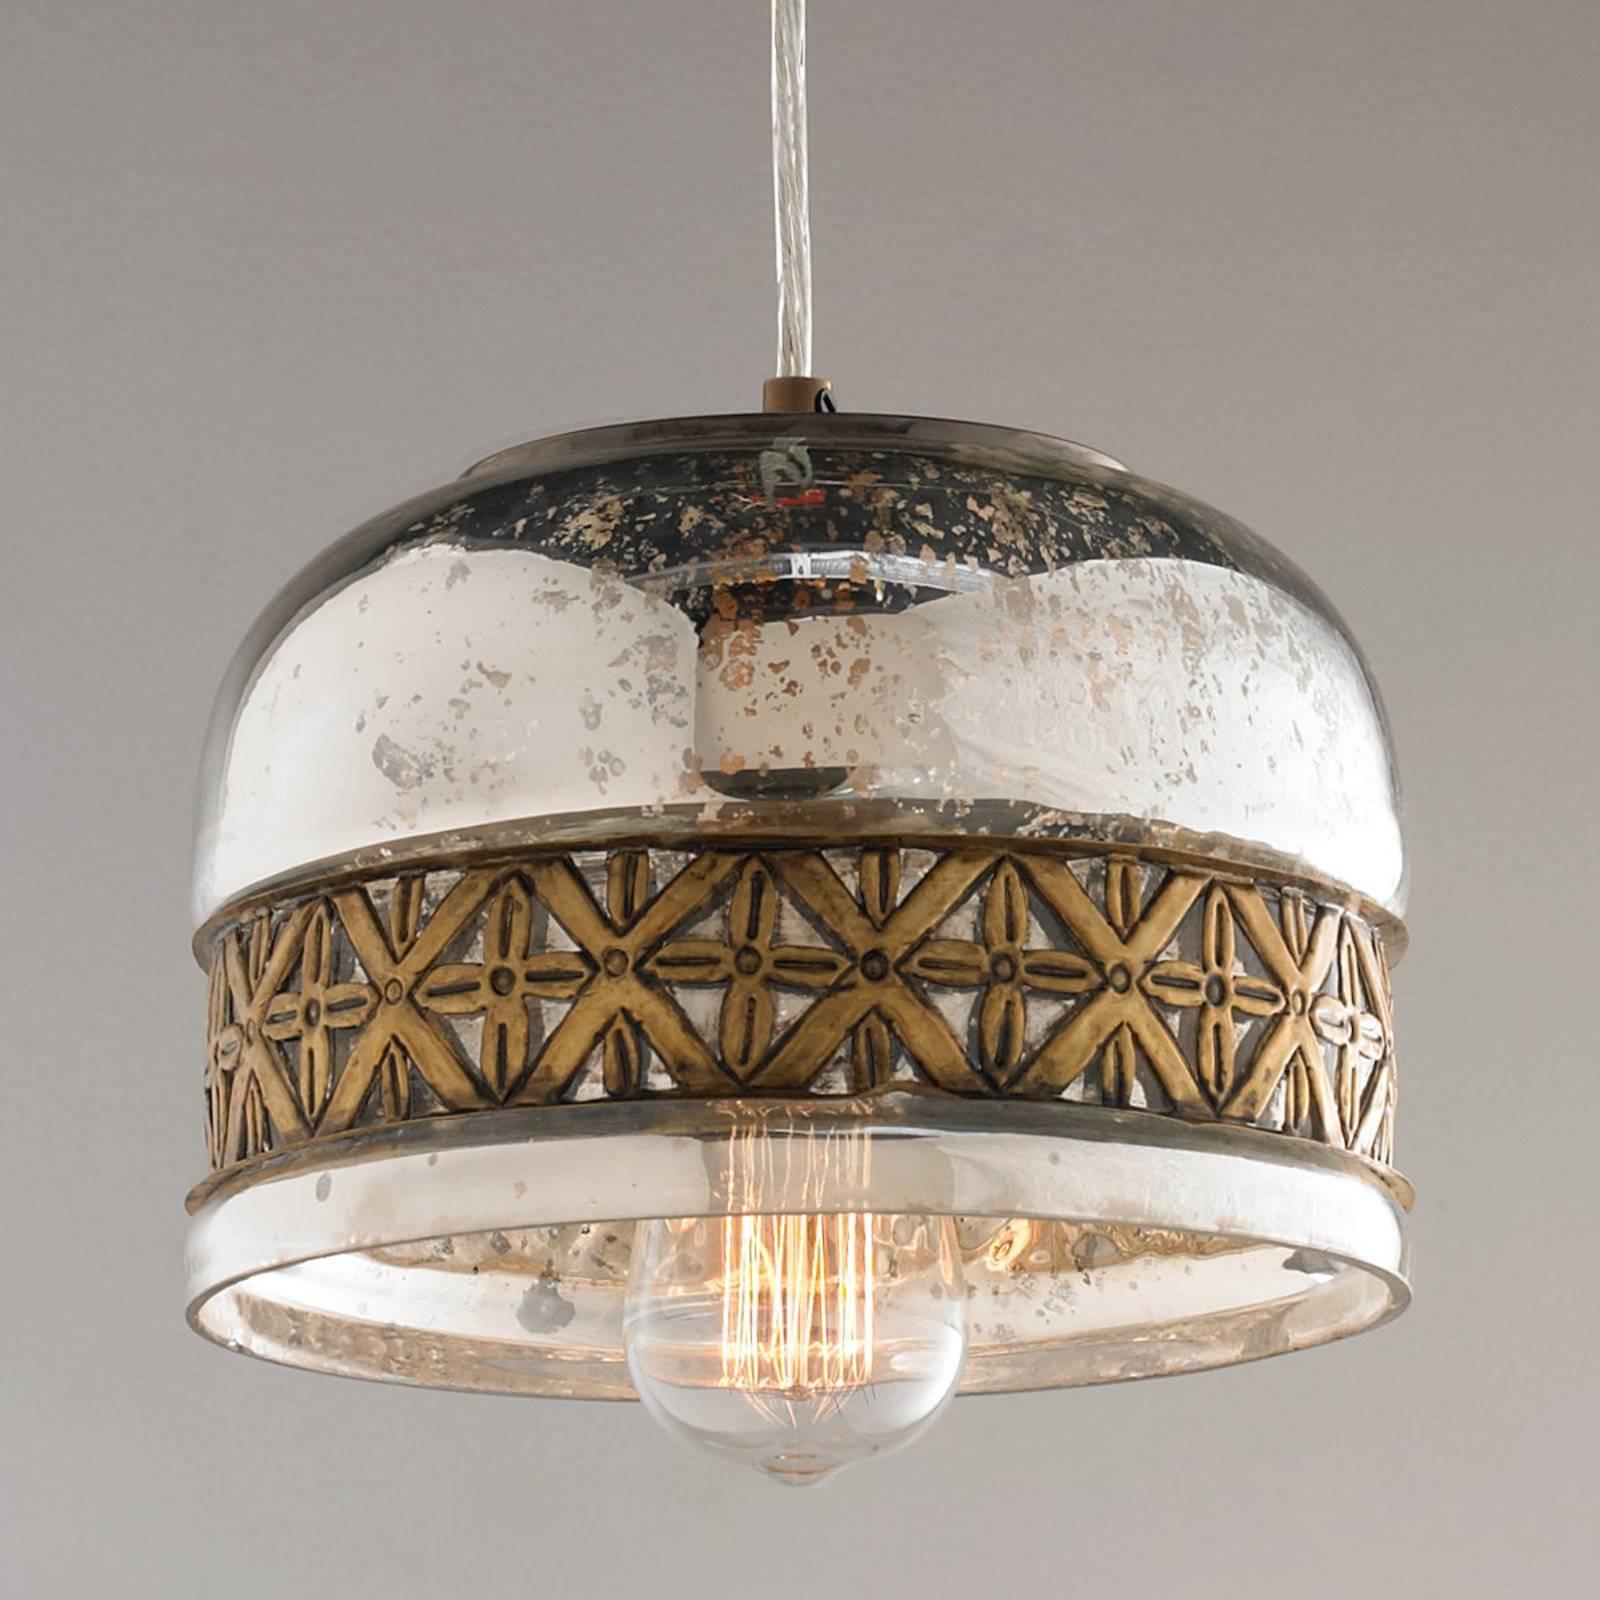 Chandelier: Fascinating Mercury Glass Chandelier | Cool Mercury for Mercury Glass Lights Fixtures (Image 4 of 15)